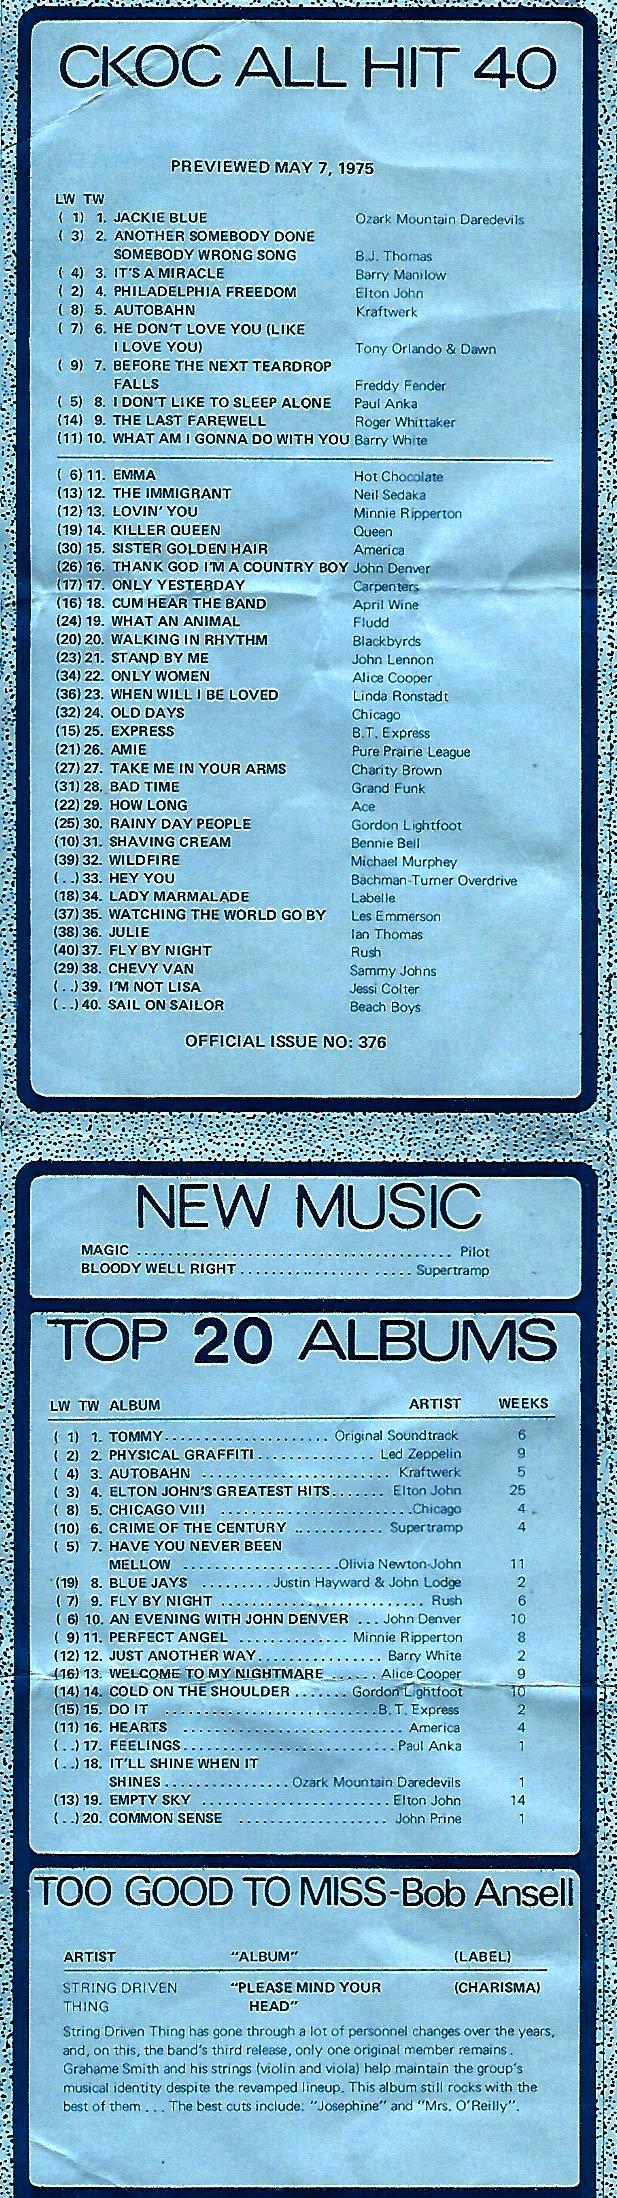 https://i.ibb.co/qDfFndY/CKOC-Hamilton-May-7-1975-Chart.jpg